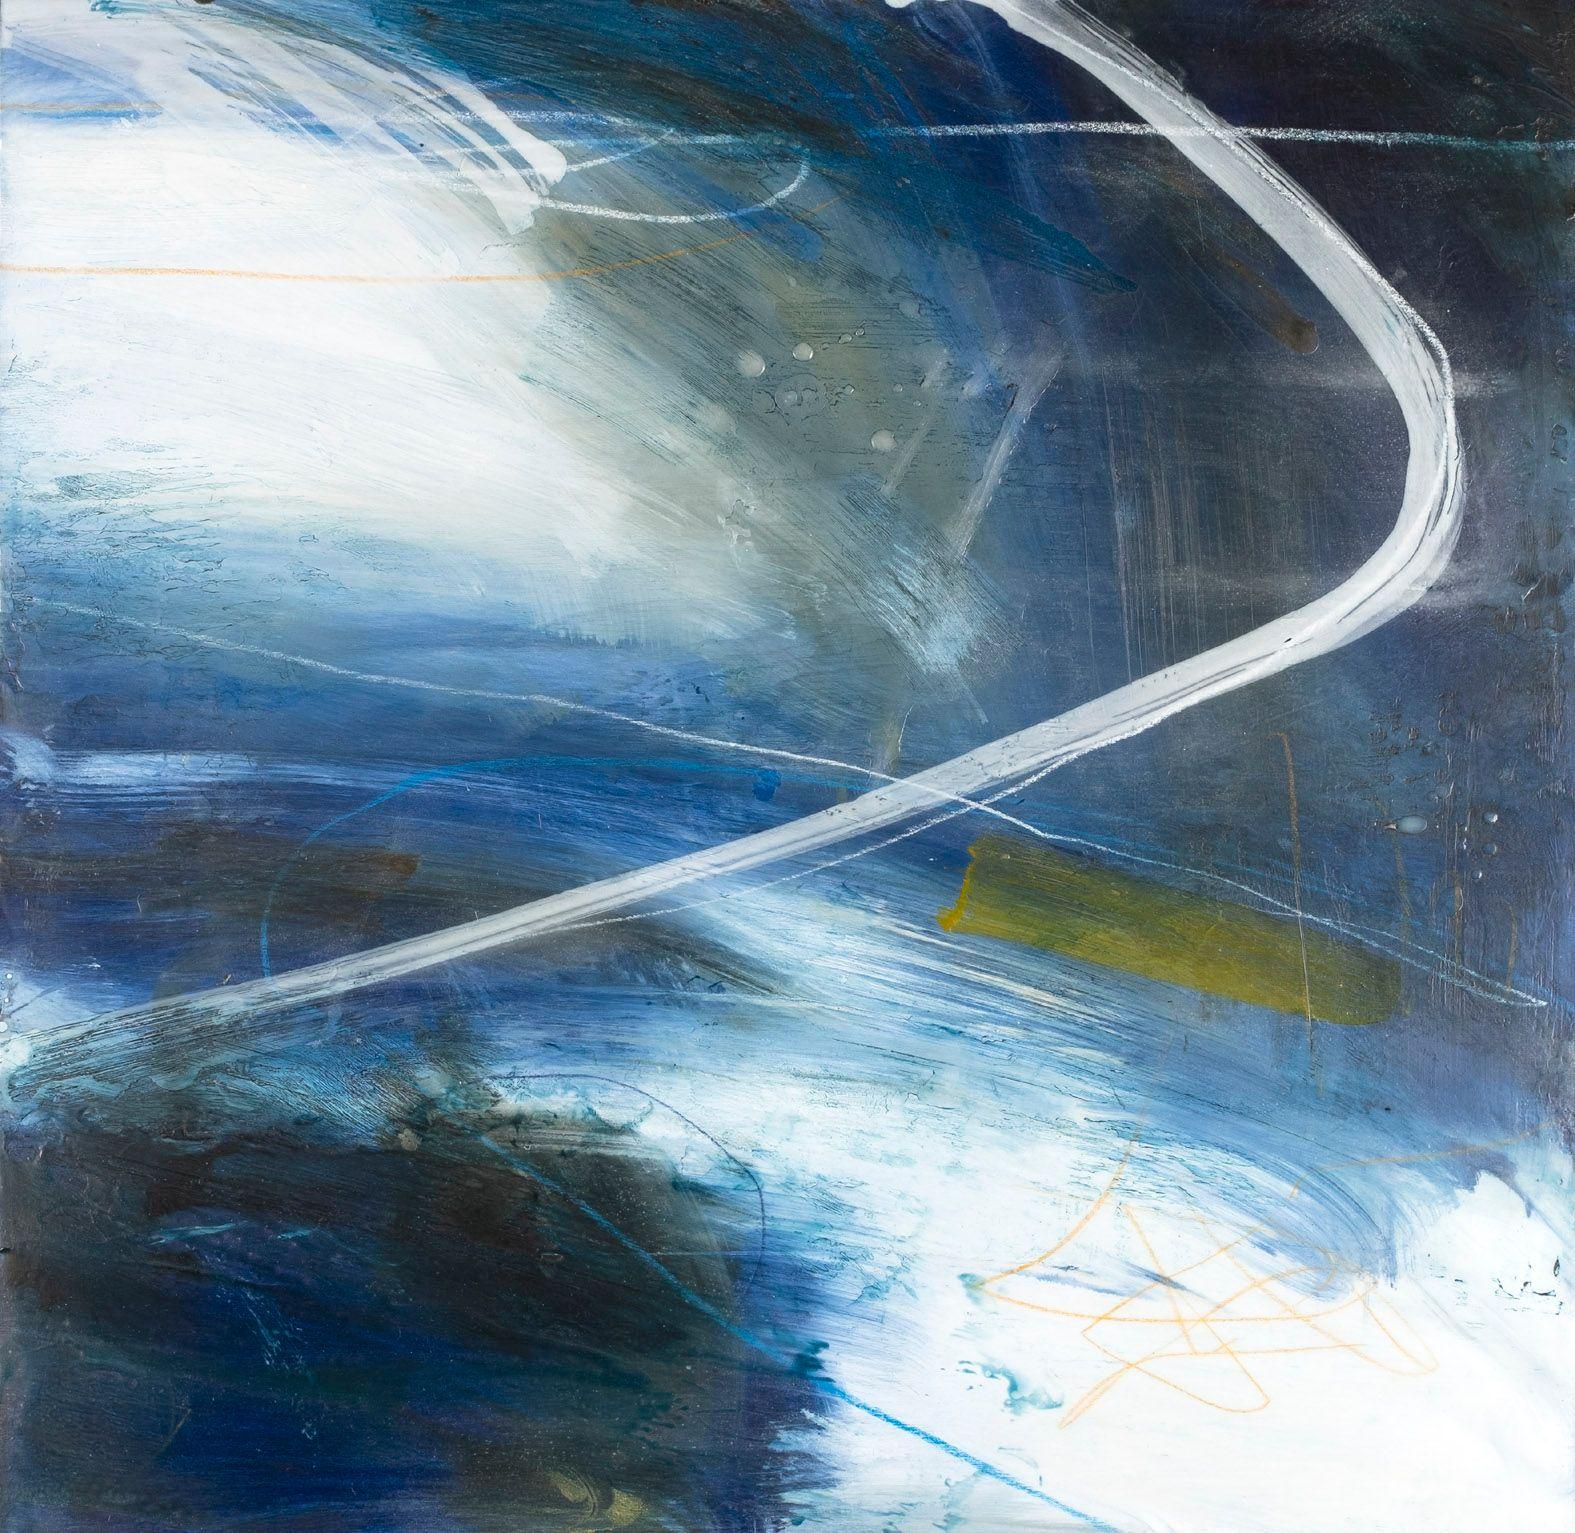 Blue encaustic wax painting